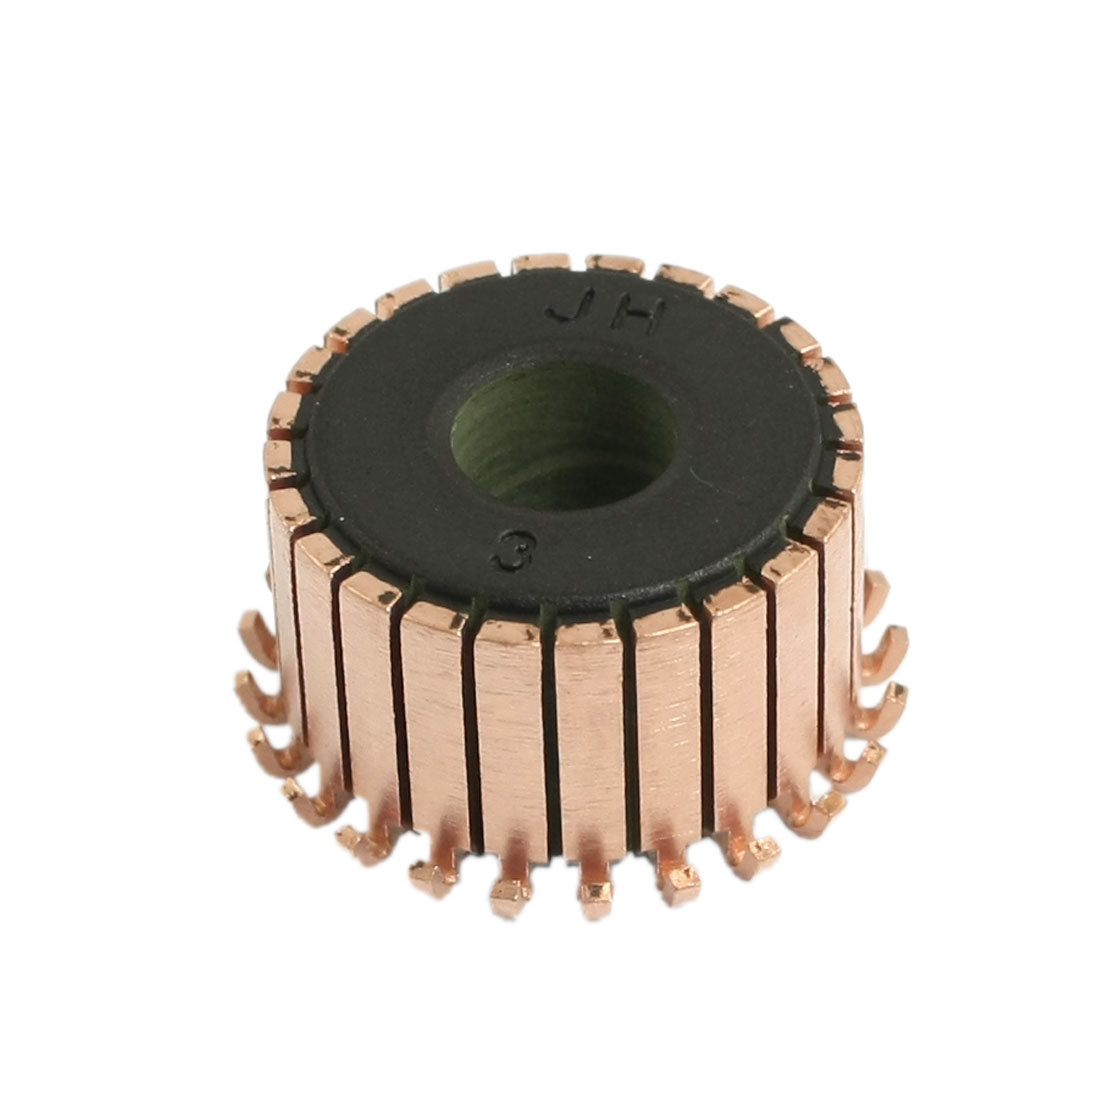 8mm x 21.5mm 24 Gear Tooth Copper Case Auto Alternator Motor Power Tool Commutator